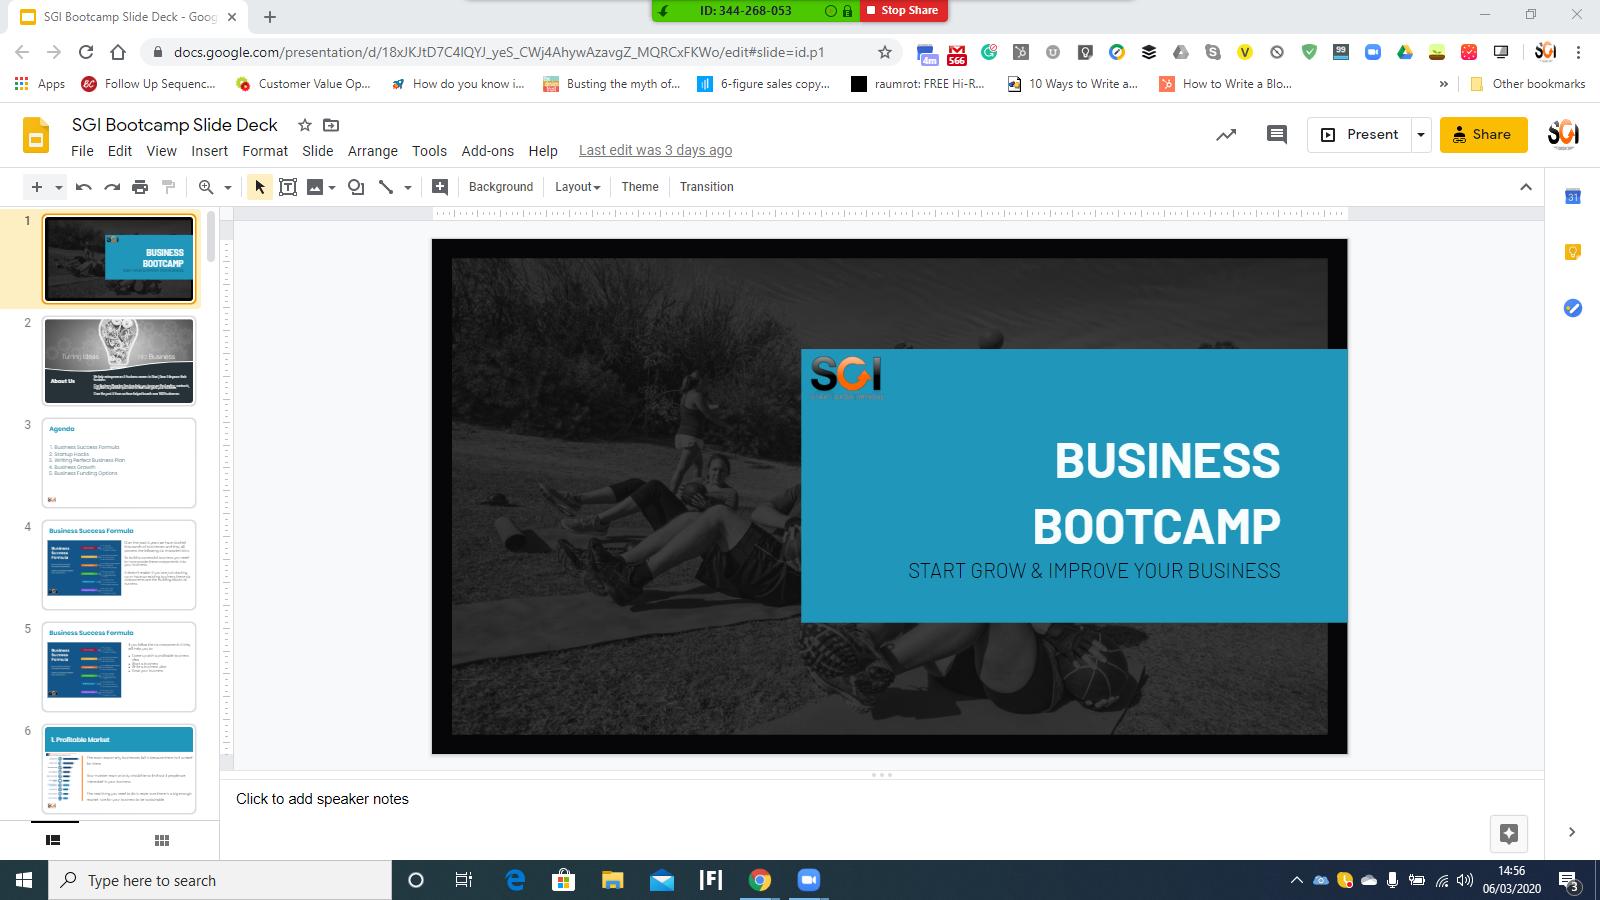 SGI bootcamp